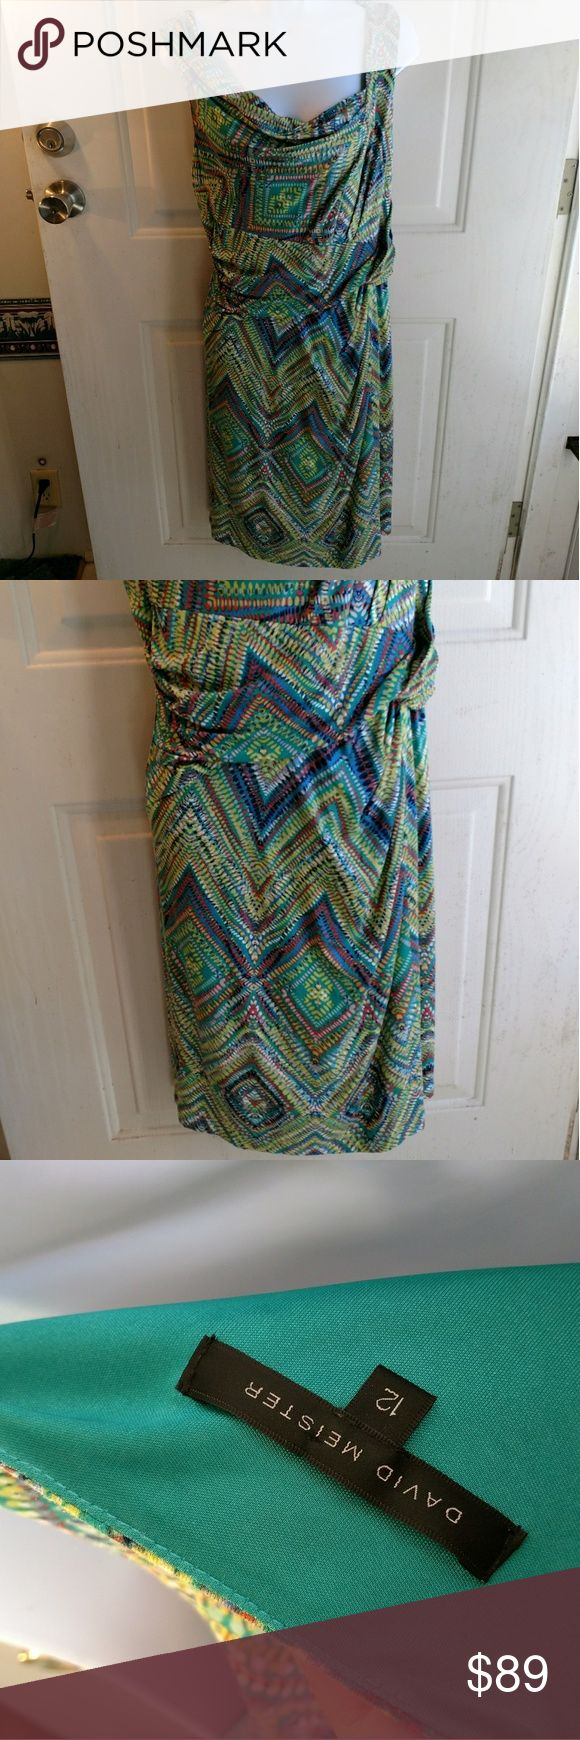 David Meister green blue chevron polka dot dress David Meister blue and green Chevron with polka dot print sleeveless, faux wrap dress. Size 12. Gently used with no flaws.  b9-118 David Meister Dresses Midi